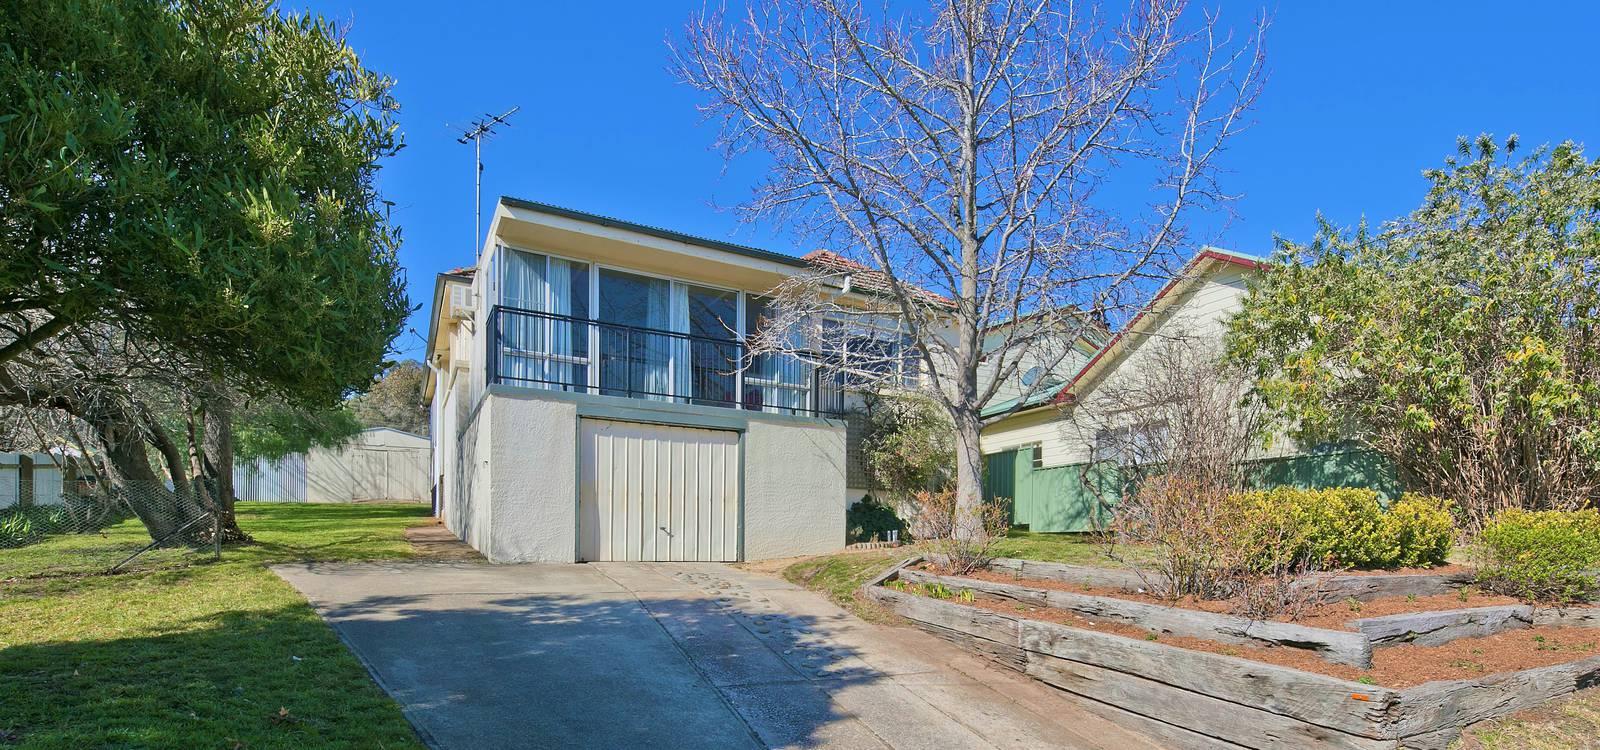 59 Eleanor Street GOULBURN, NSW 2580 - photo 1